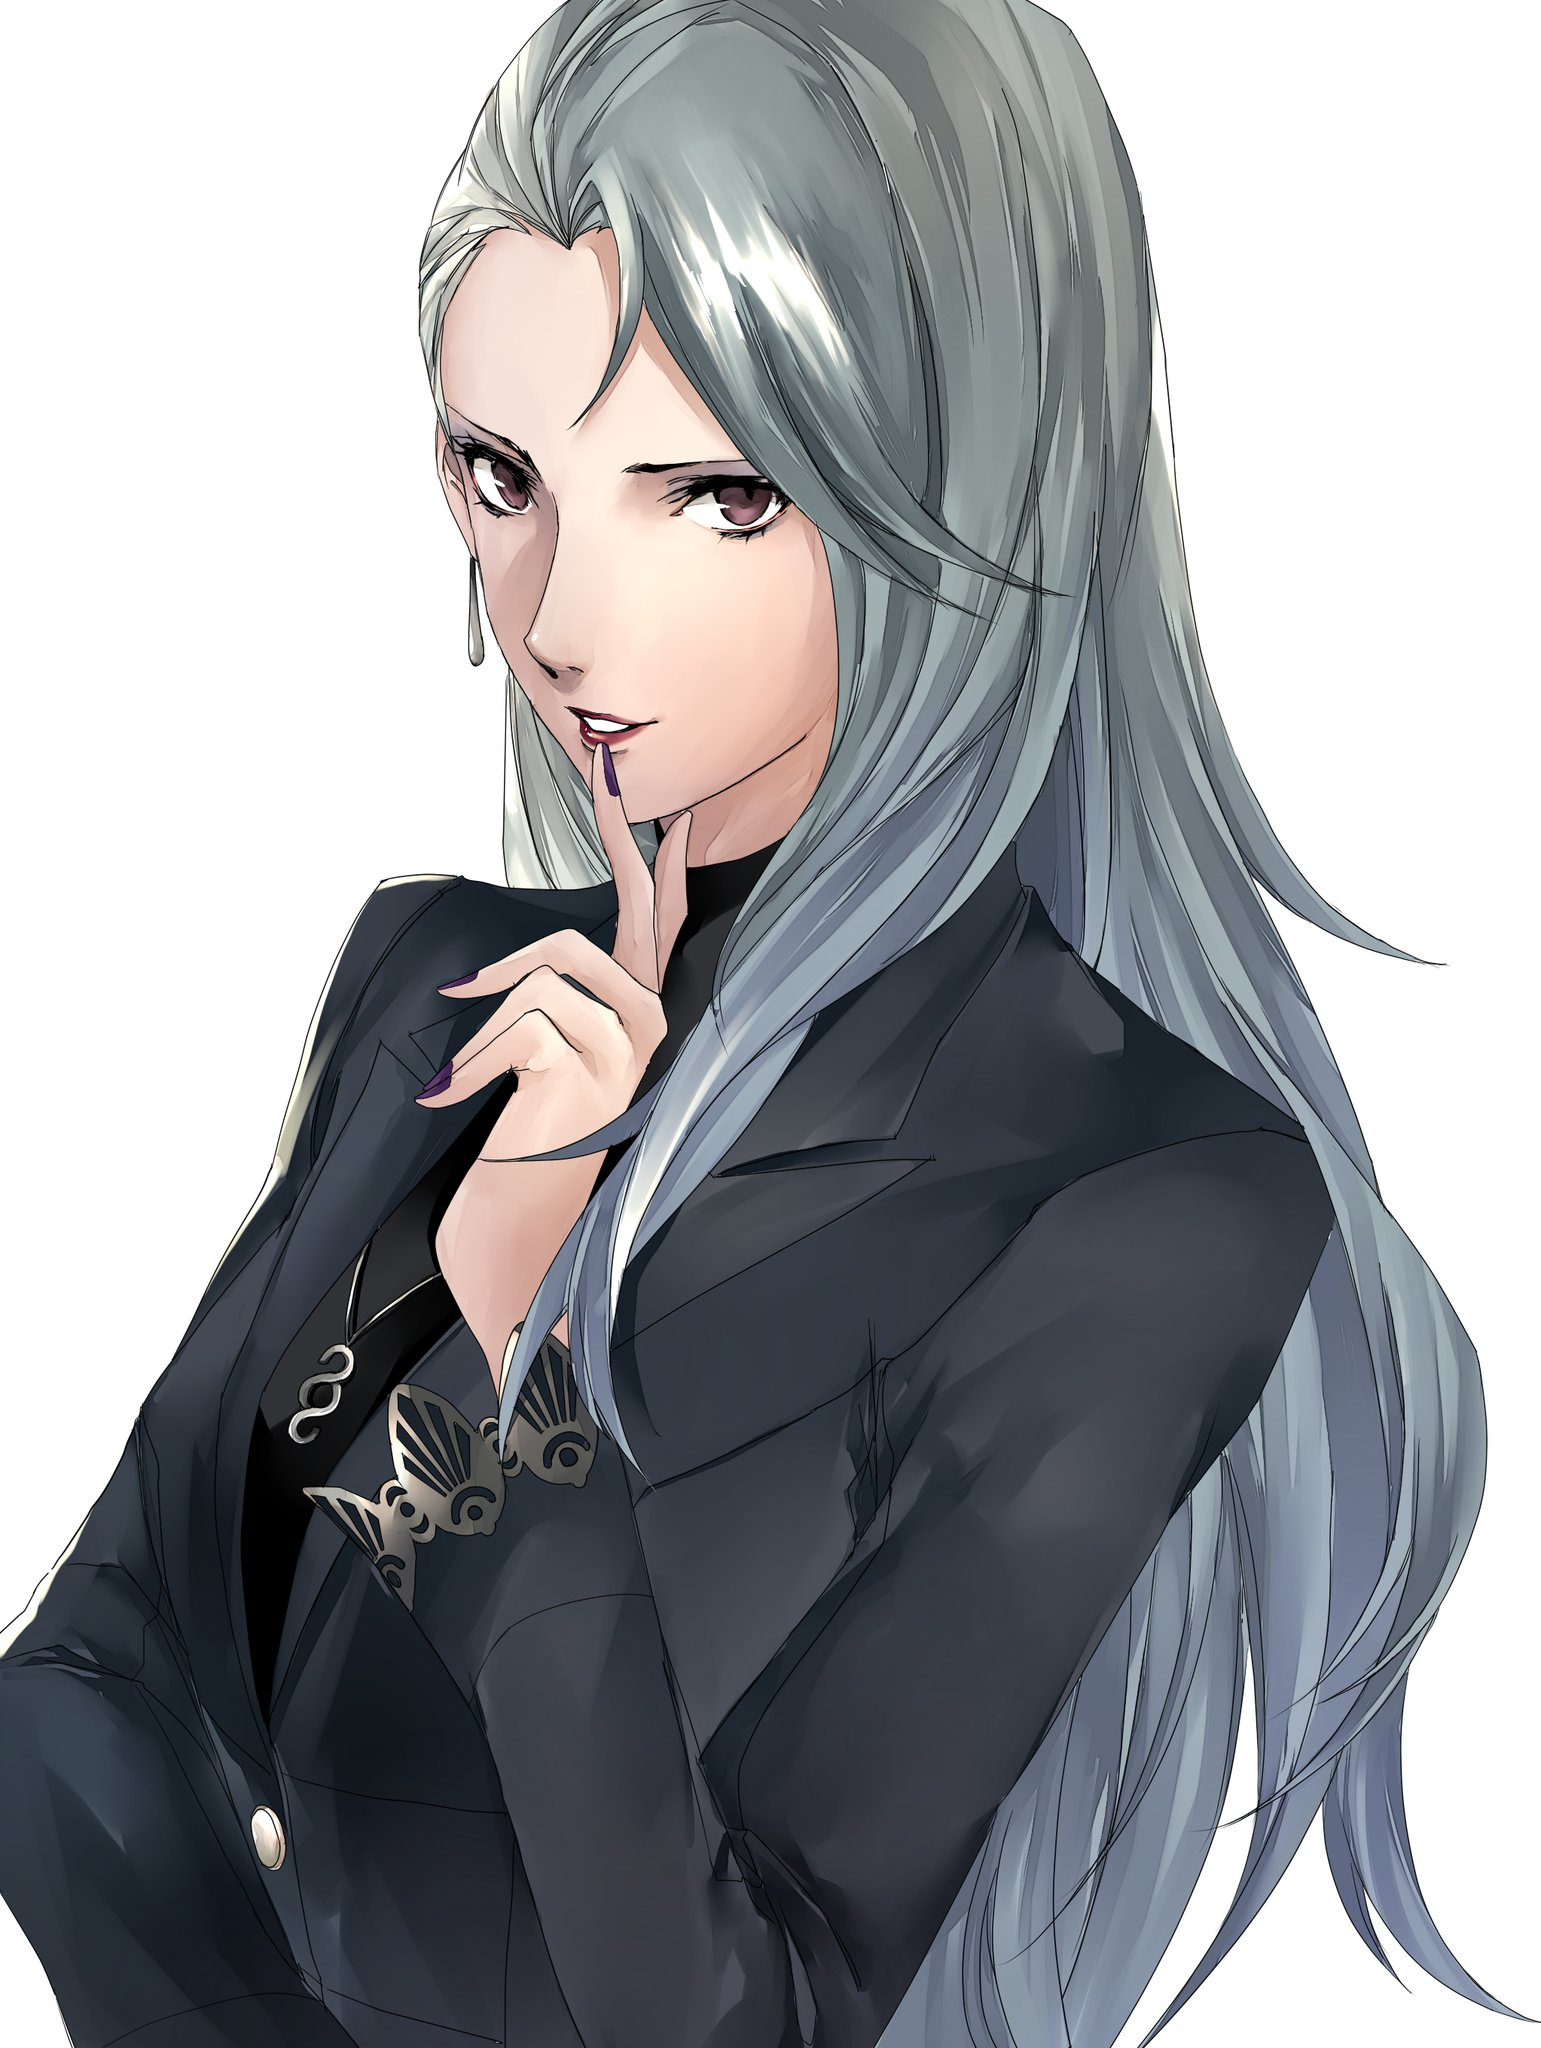 Persona-5-Persona-Игры-Takemi-Tae-6406009.jpeg - Persona 5